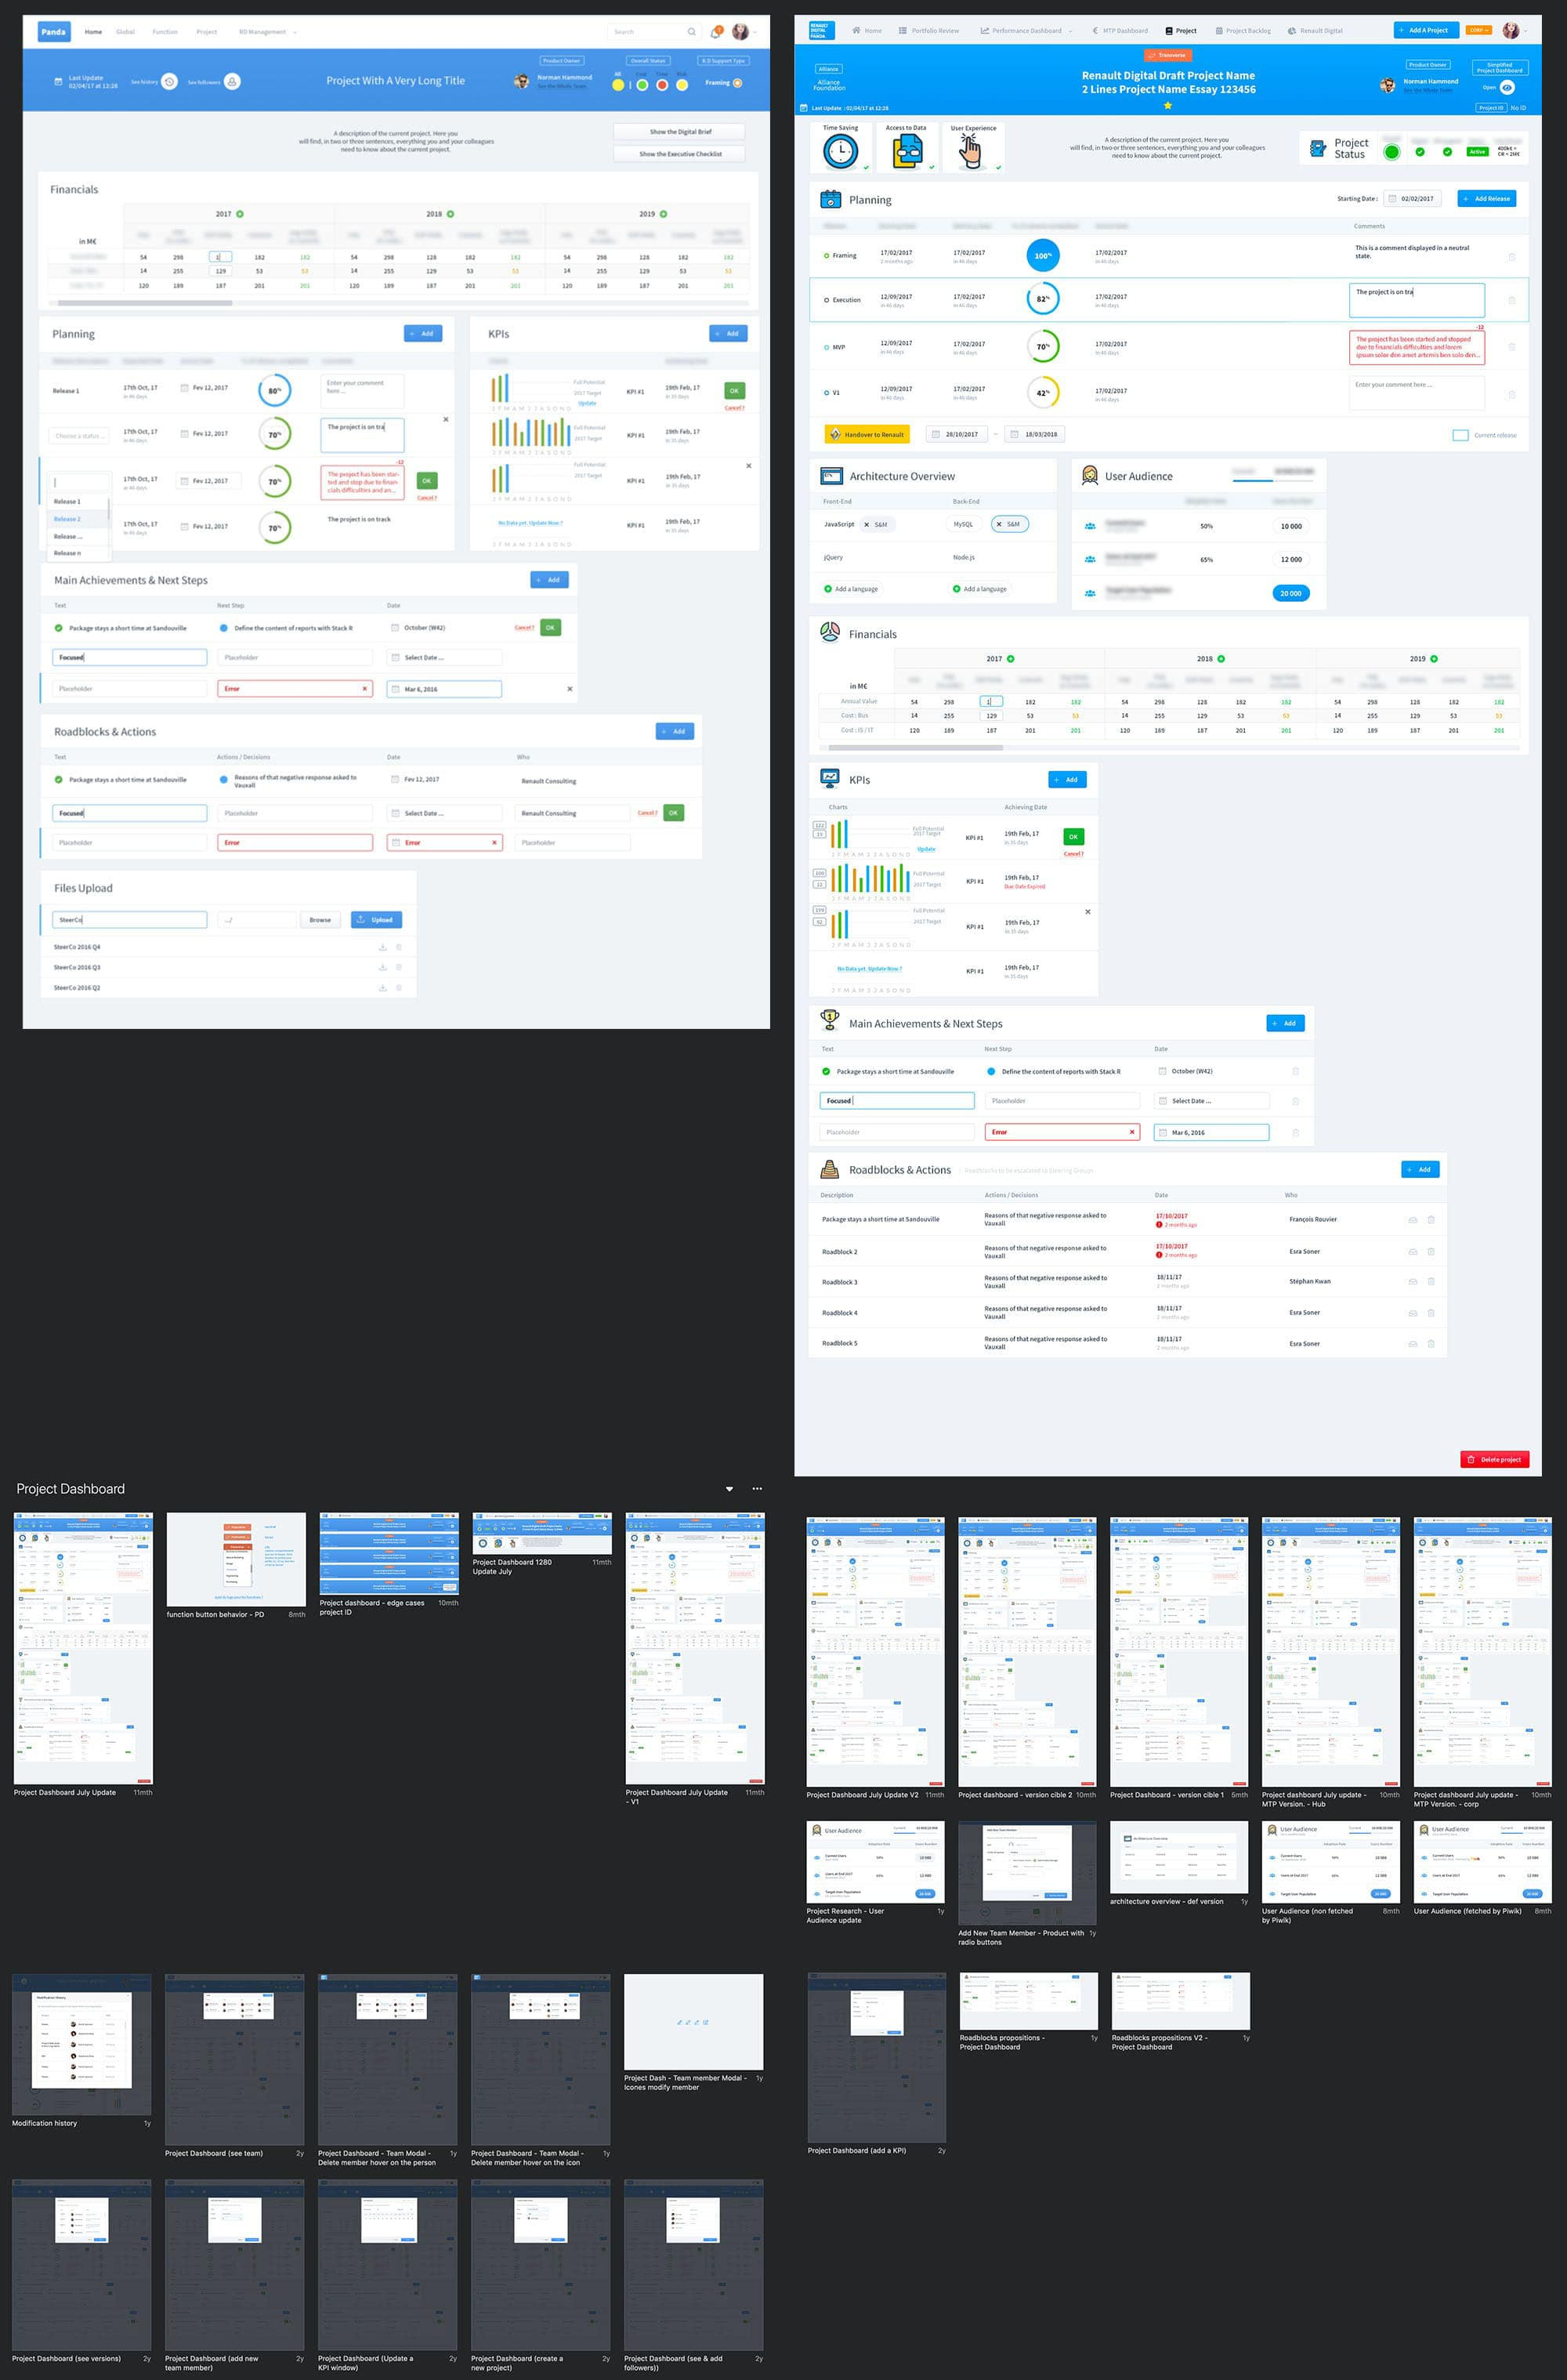 Panda-dashboard-final-designs-project-dashboard-ux-blurred